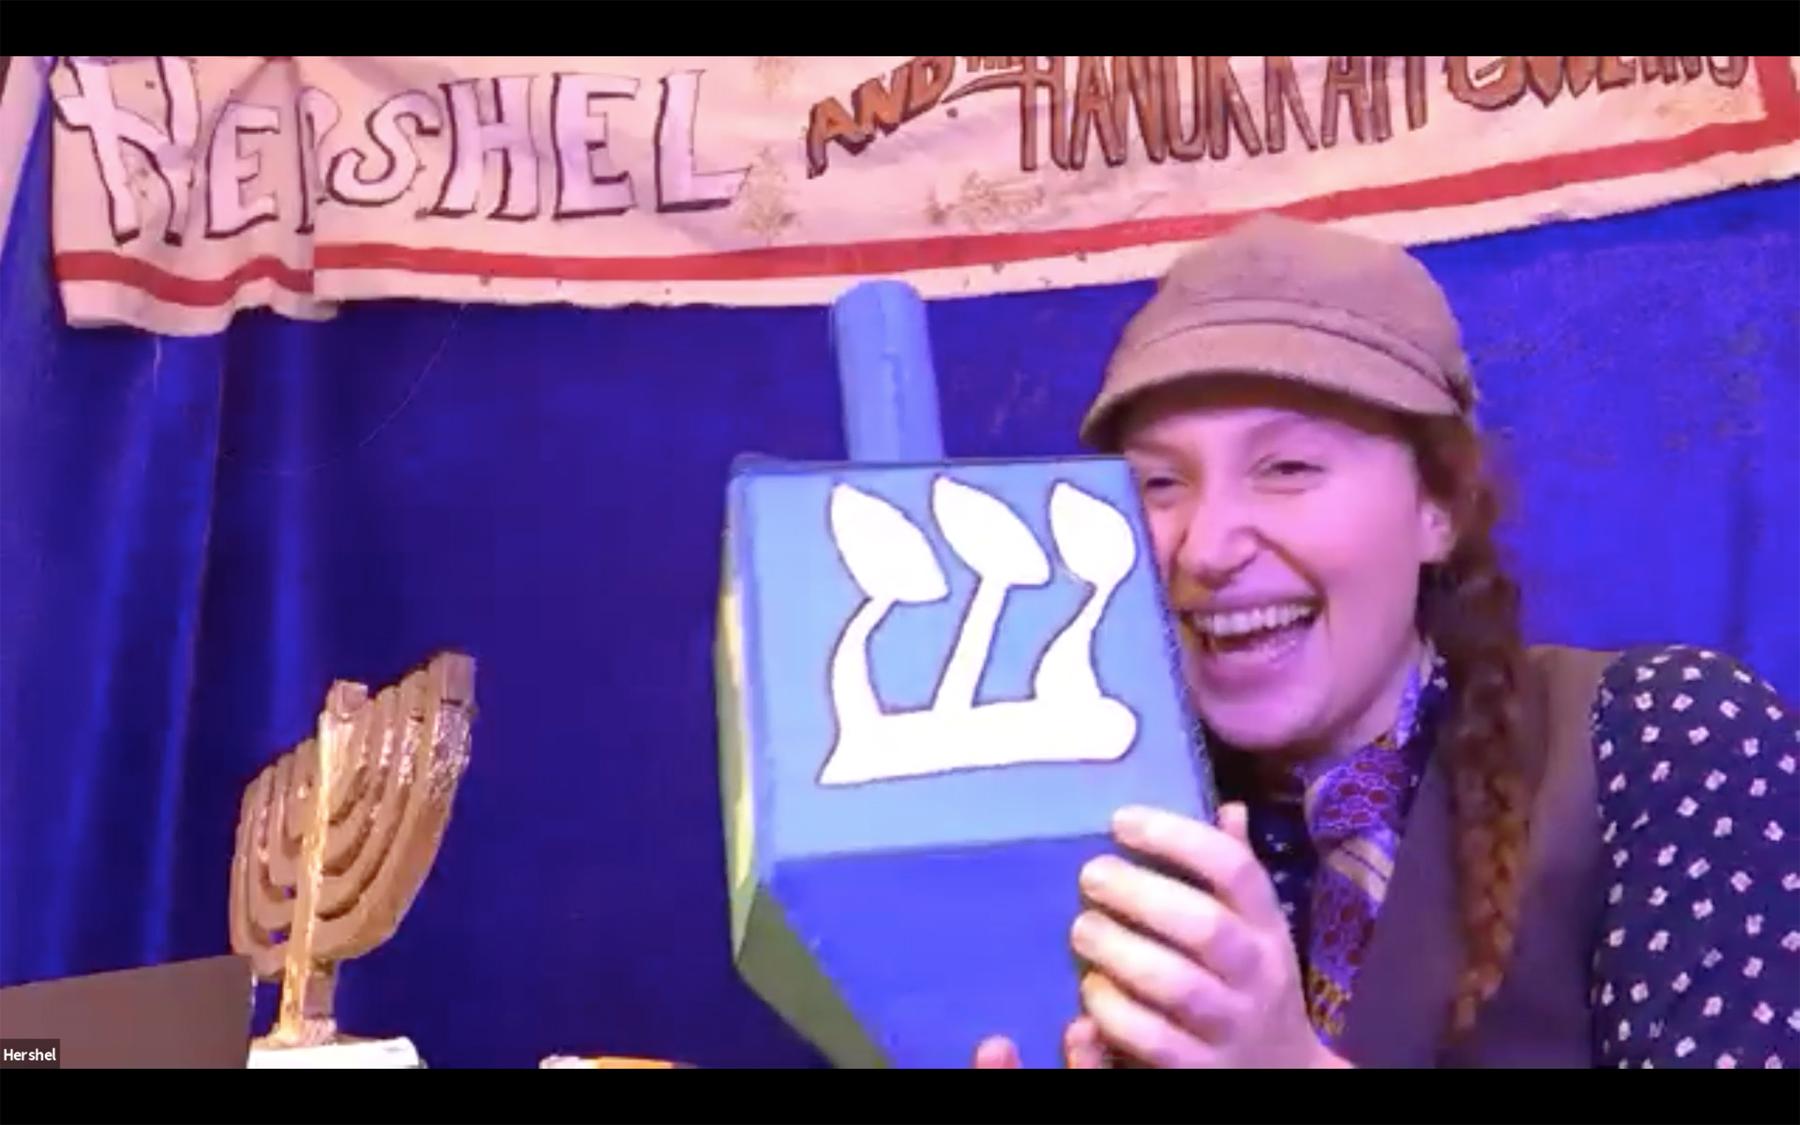 Strawdog Theatre Presents HERSHEL AND THE HANUKKAH GOBLINS